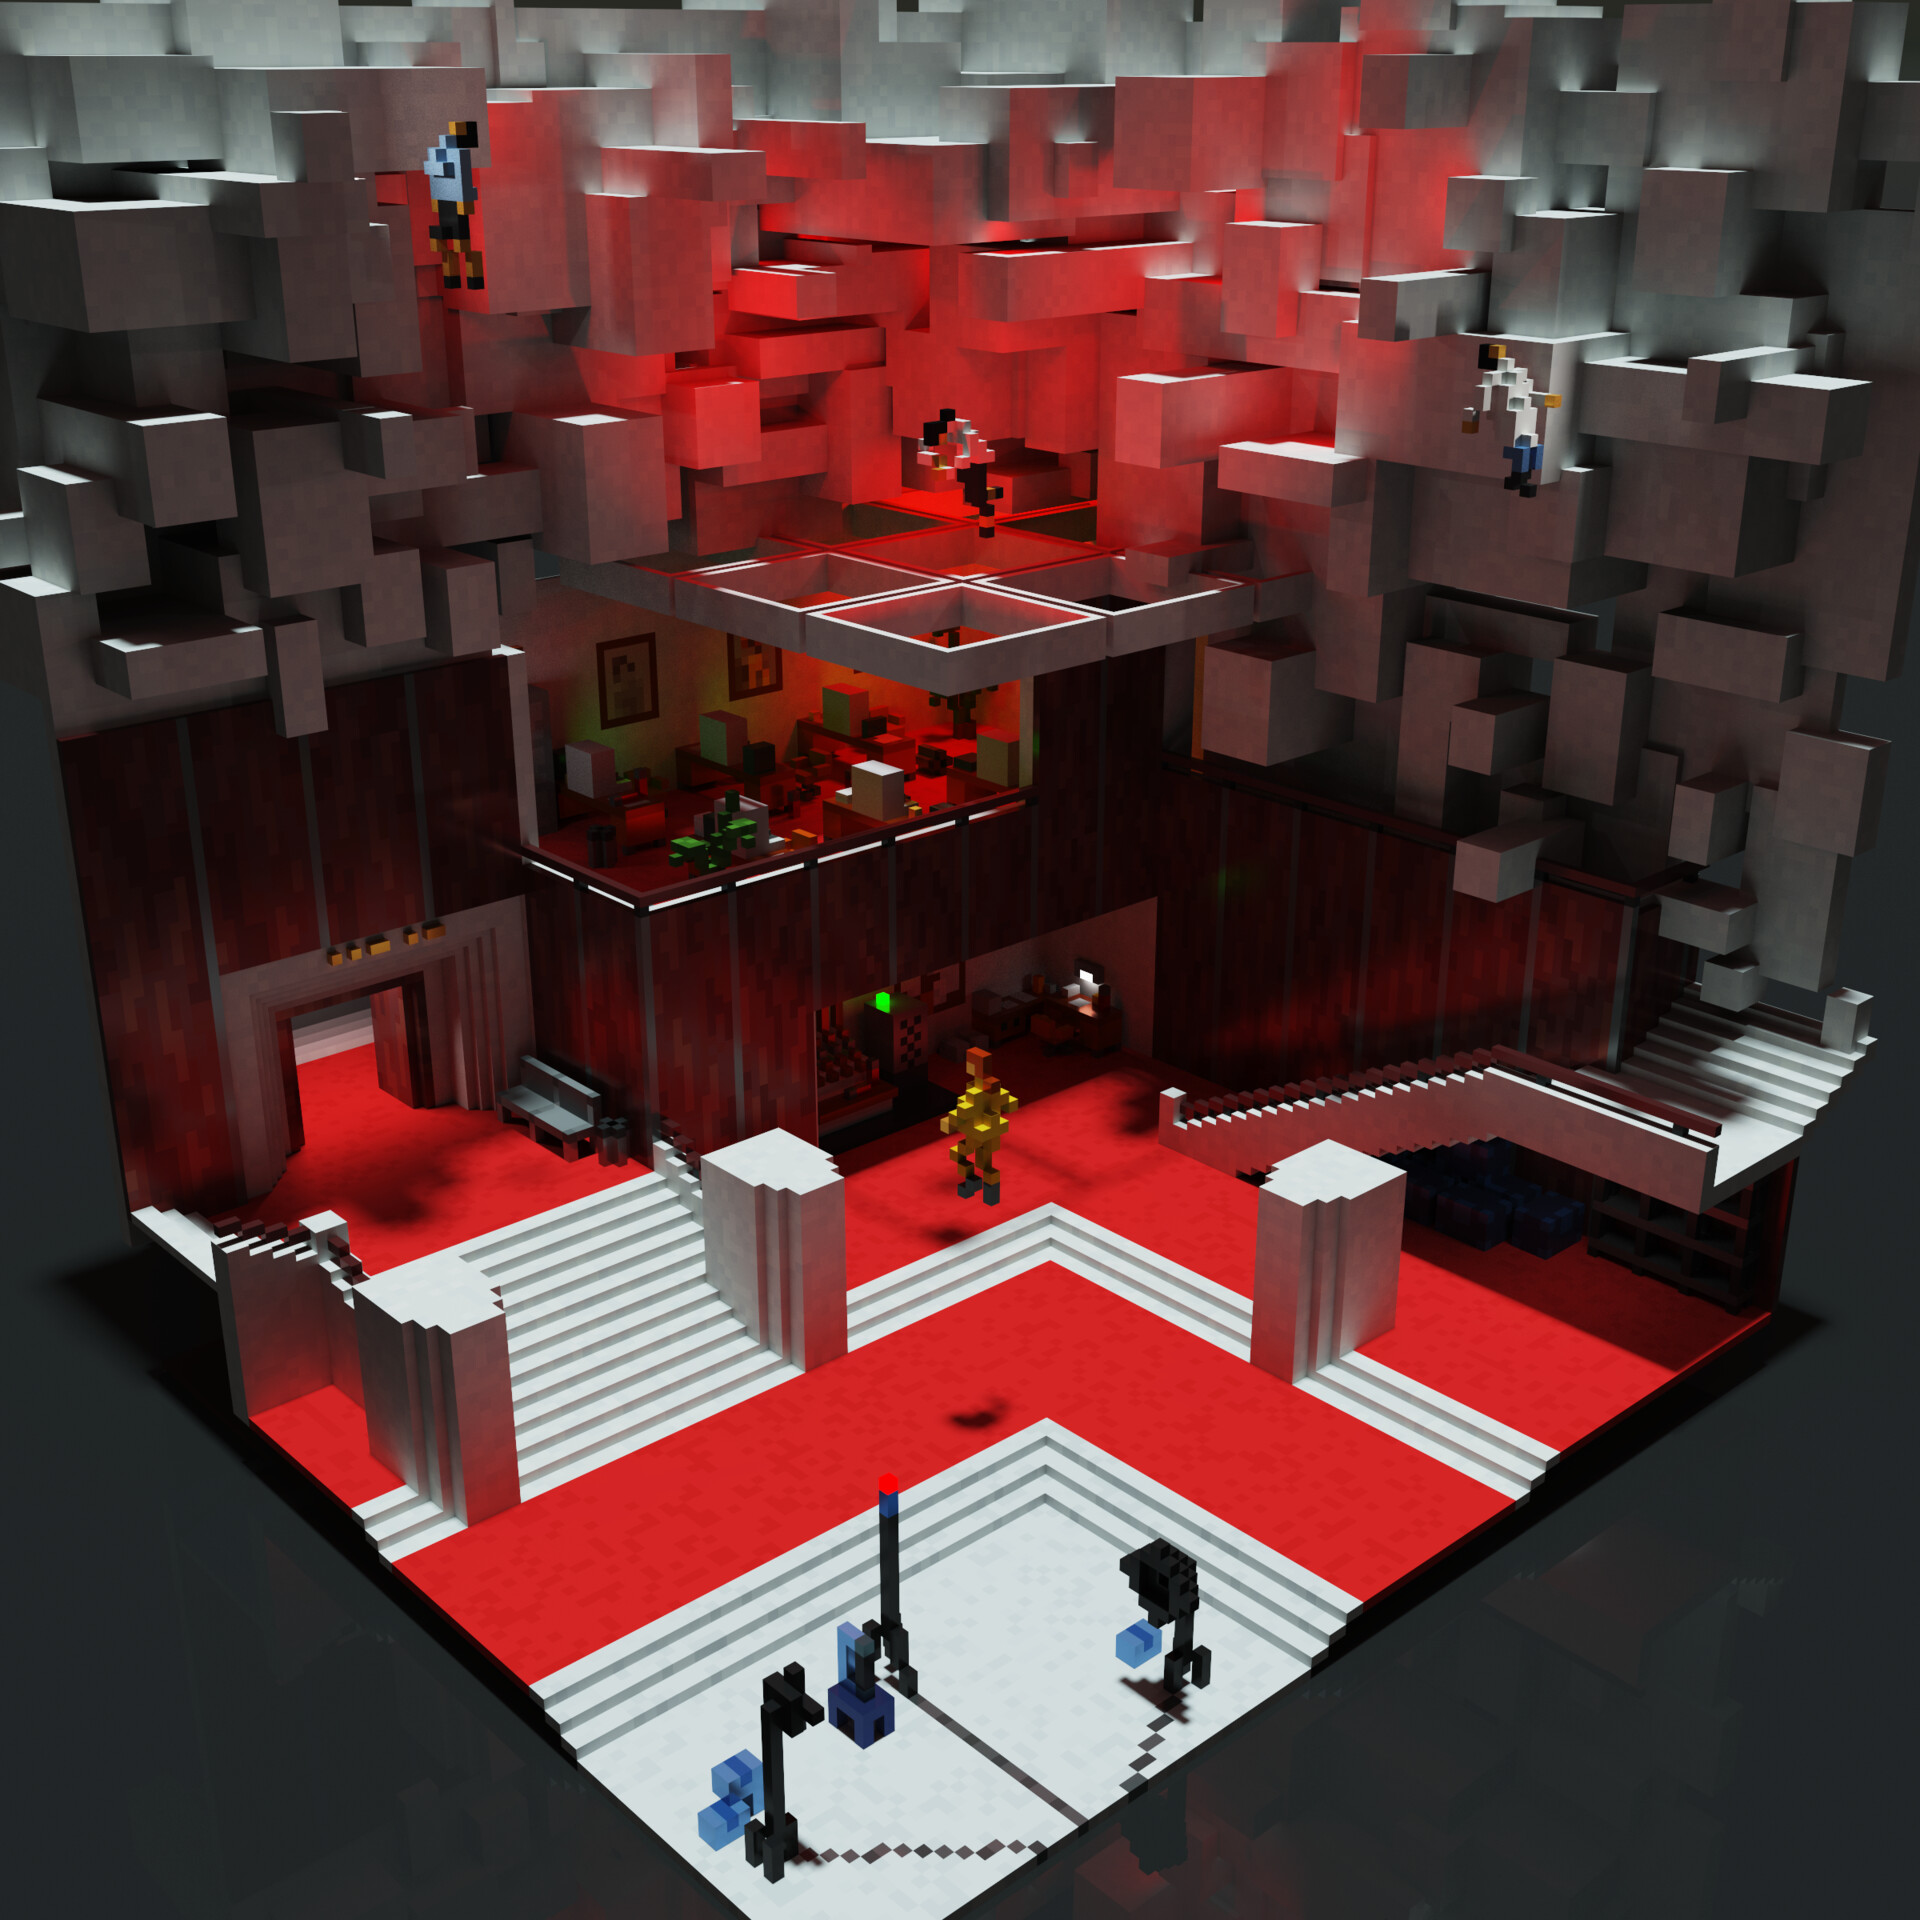 < Director Faden / Golden Executive > MagicaVoxel render - June 2020